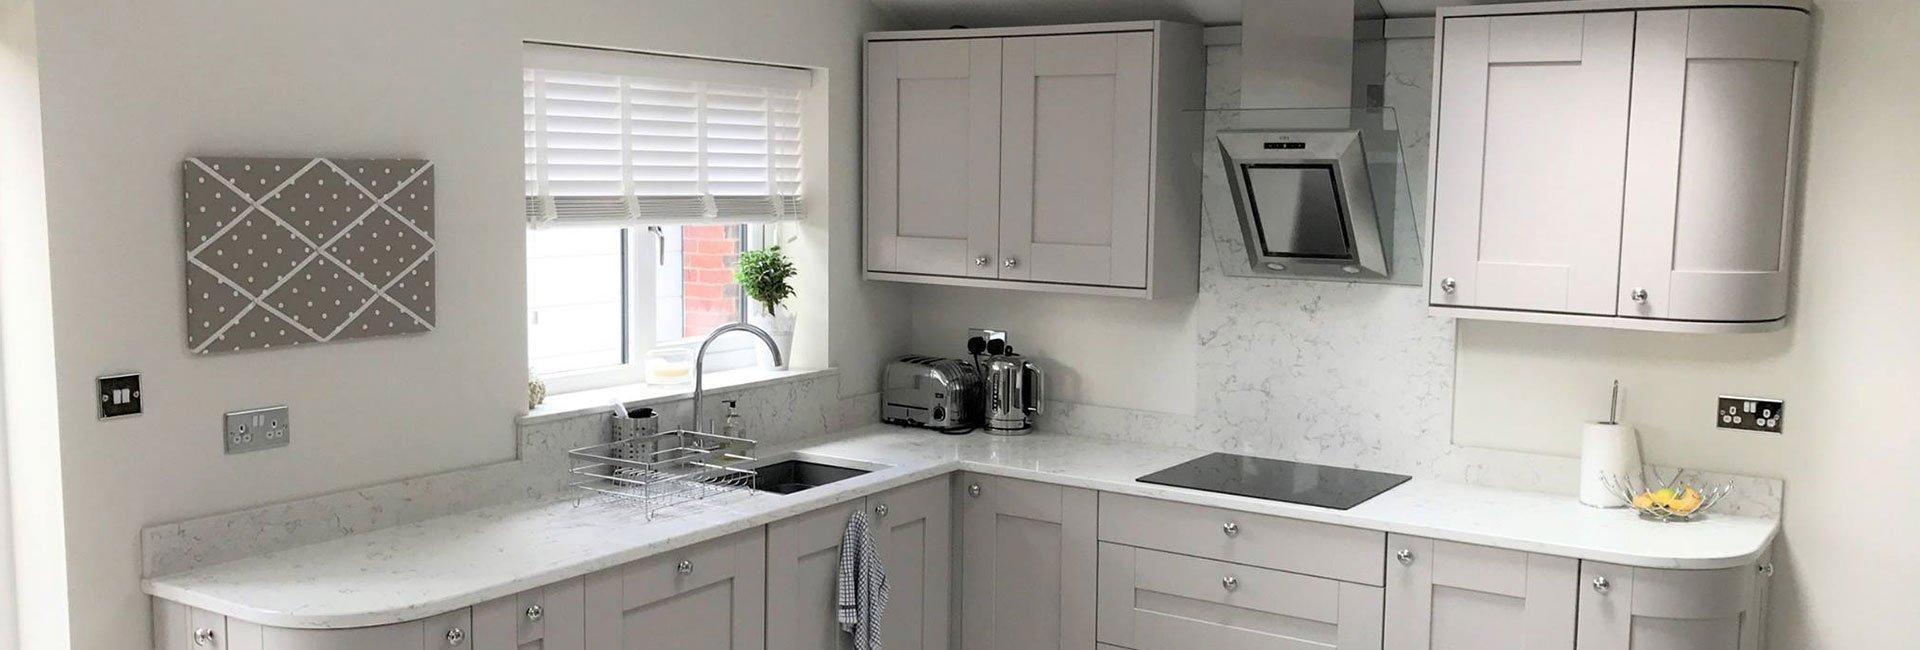 Kitchen and bathroom designs| Darwen| Pure Style Bathrooms and Kitchens